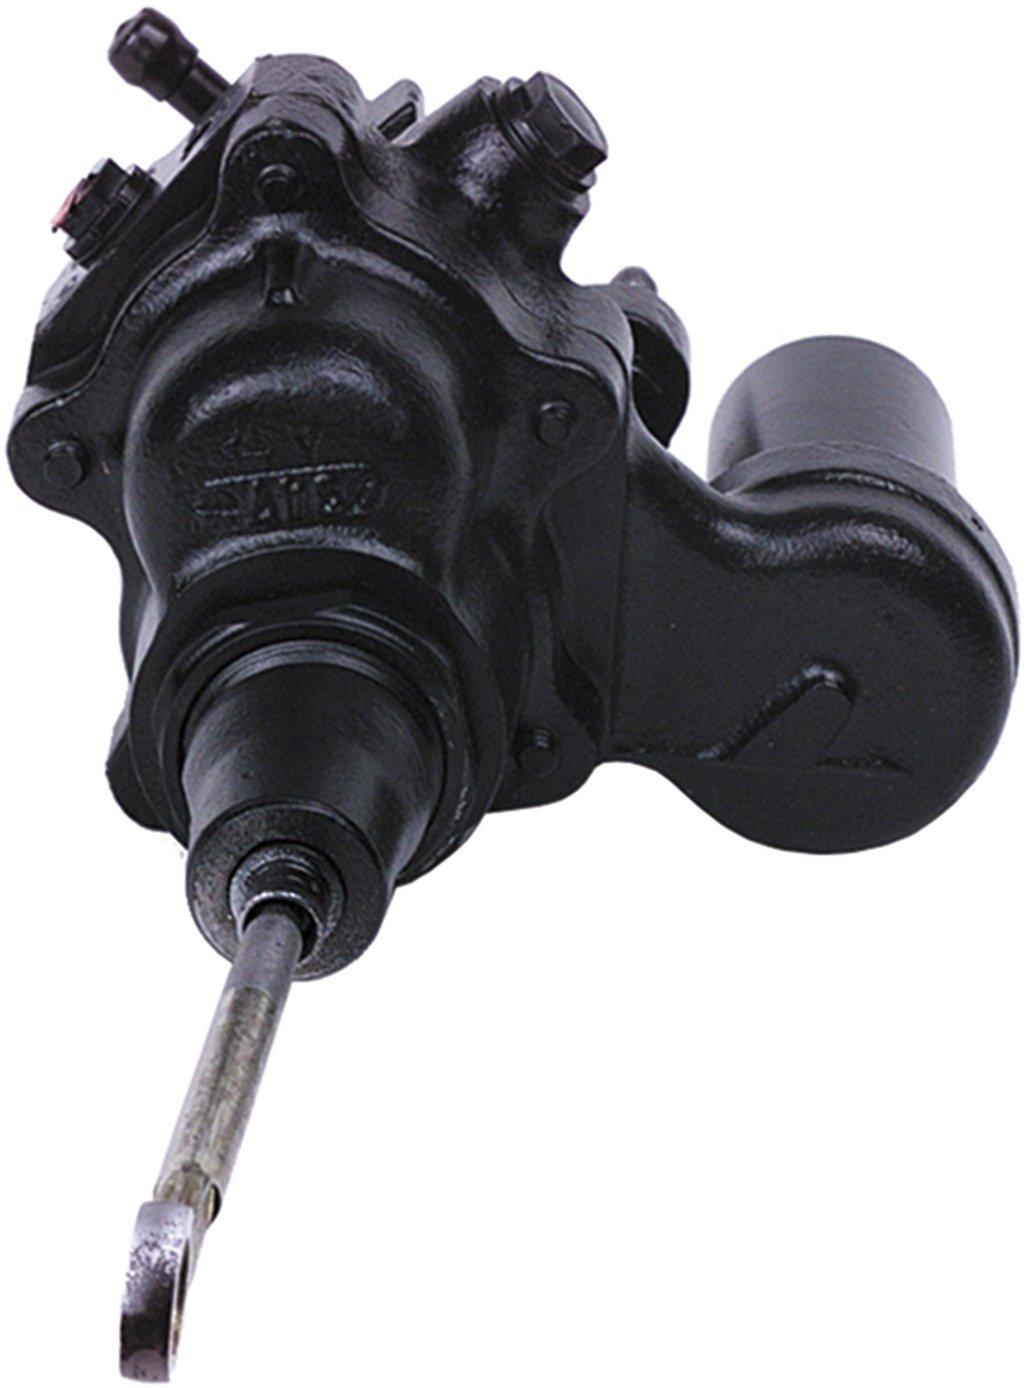 Cardone 52-7307 Remanufactured Hydroboost A1 Cardone